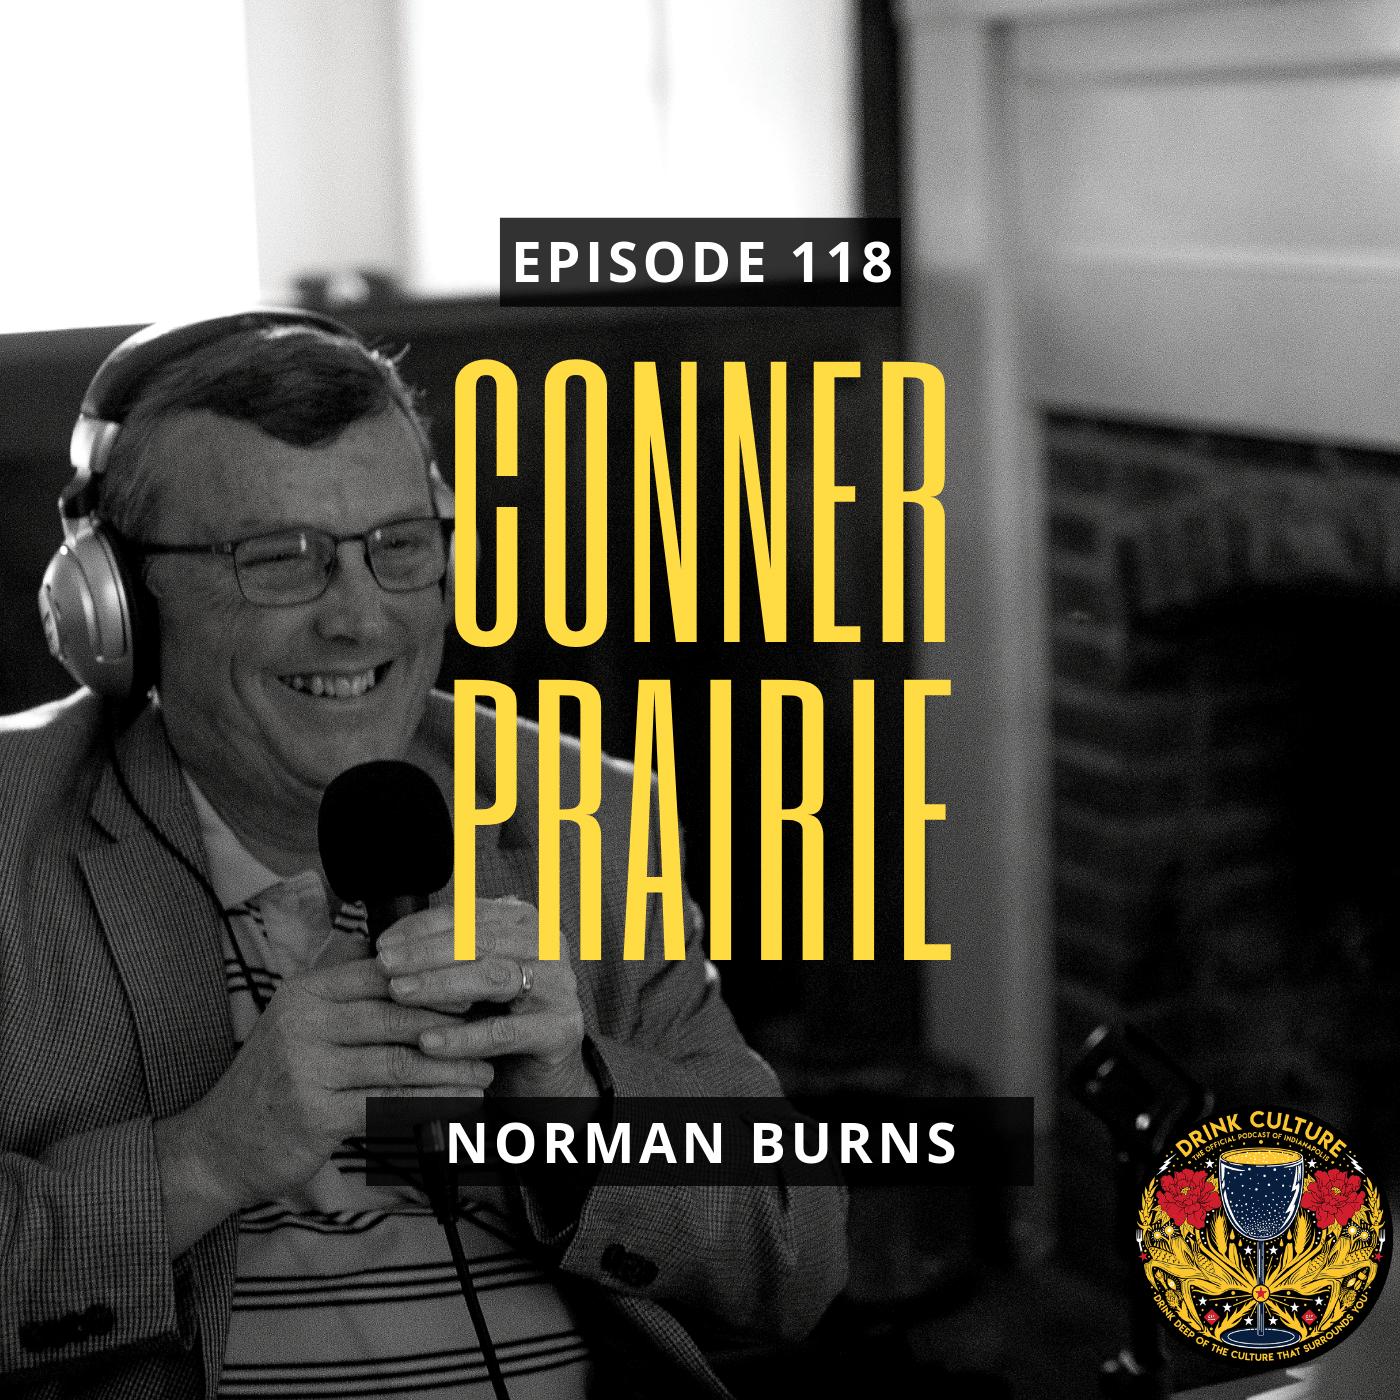 Episode 118: Conner Prairie, Norman Burns -